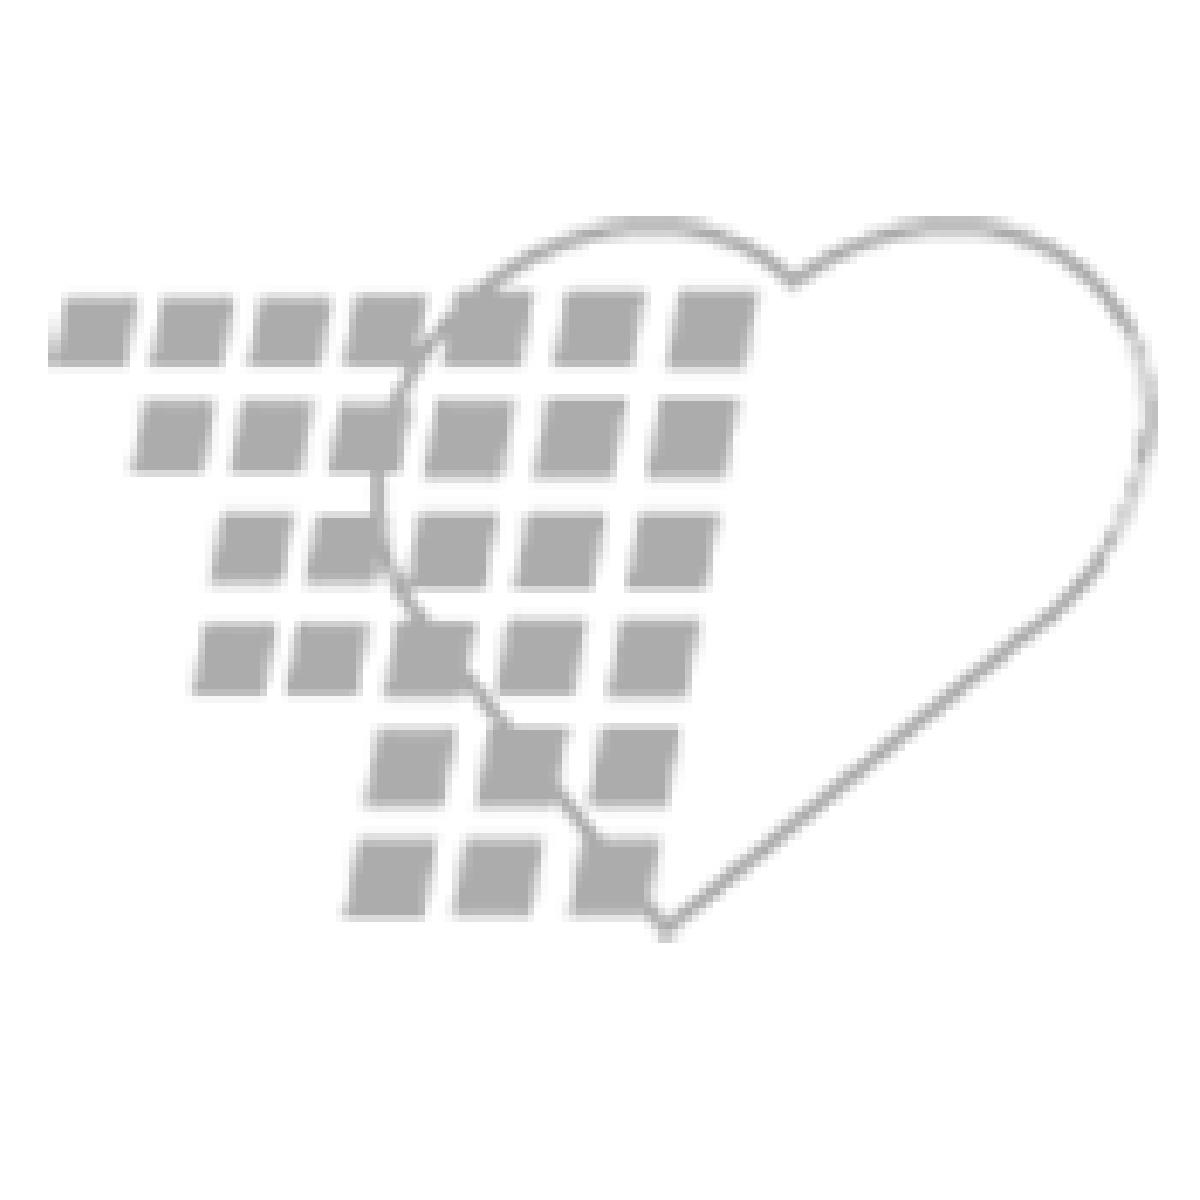 09-09-9762 - Basic Nursing and Nurse Aide Training 5 DVD Series